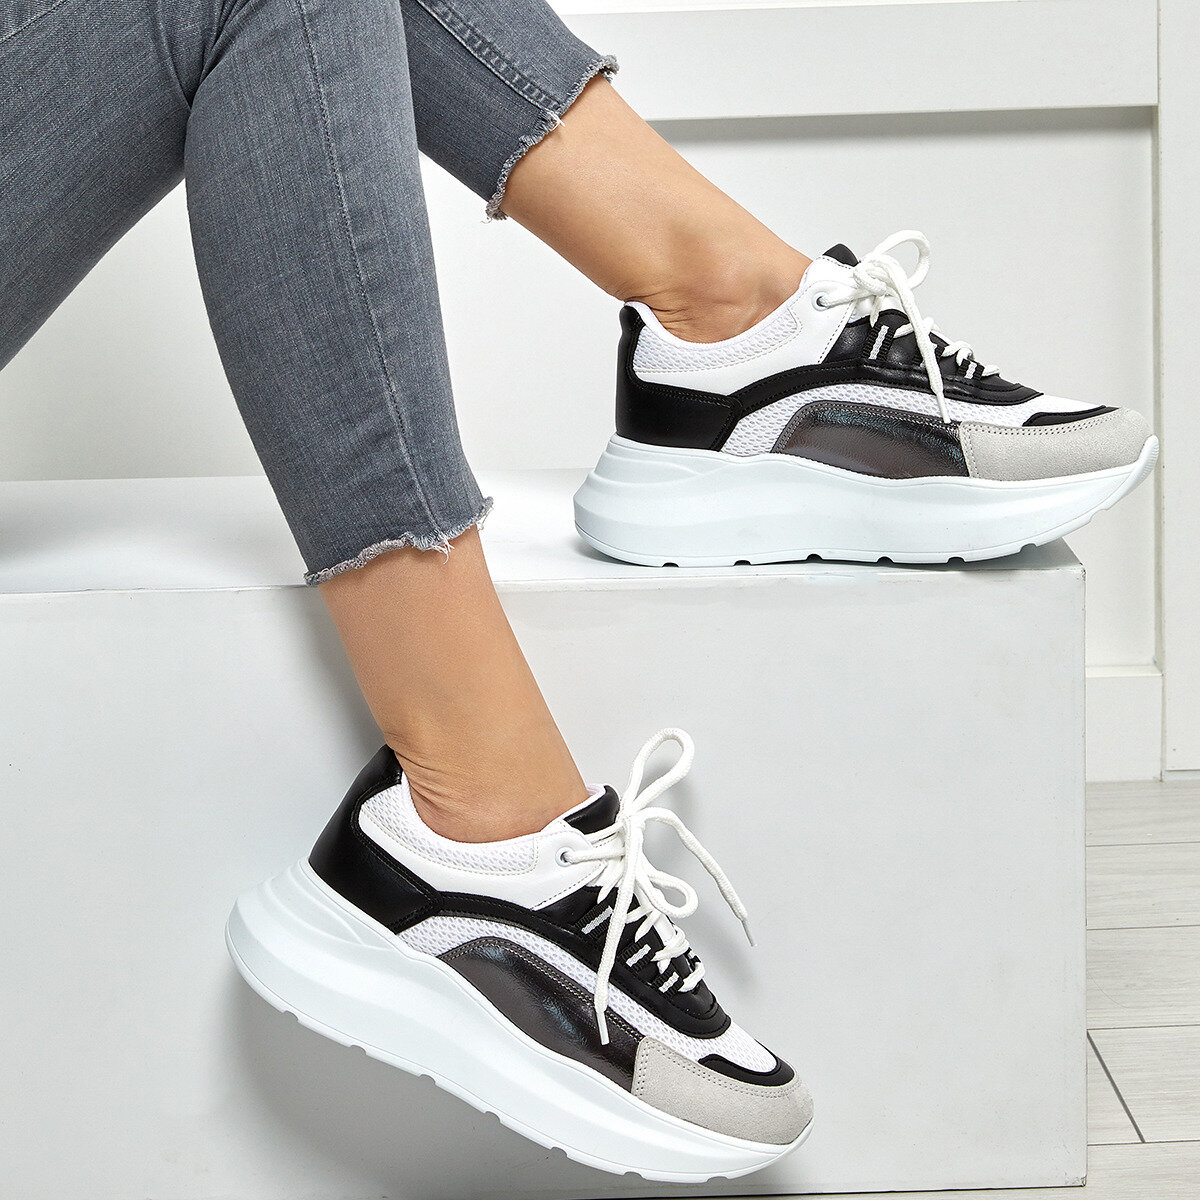 FLO 19SF-2059 White Women 'S Sneaker Shoes BUTIGO